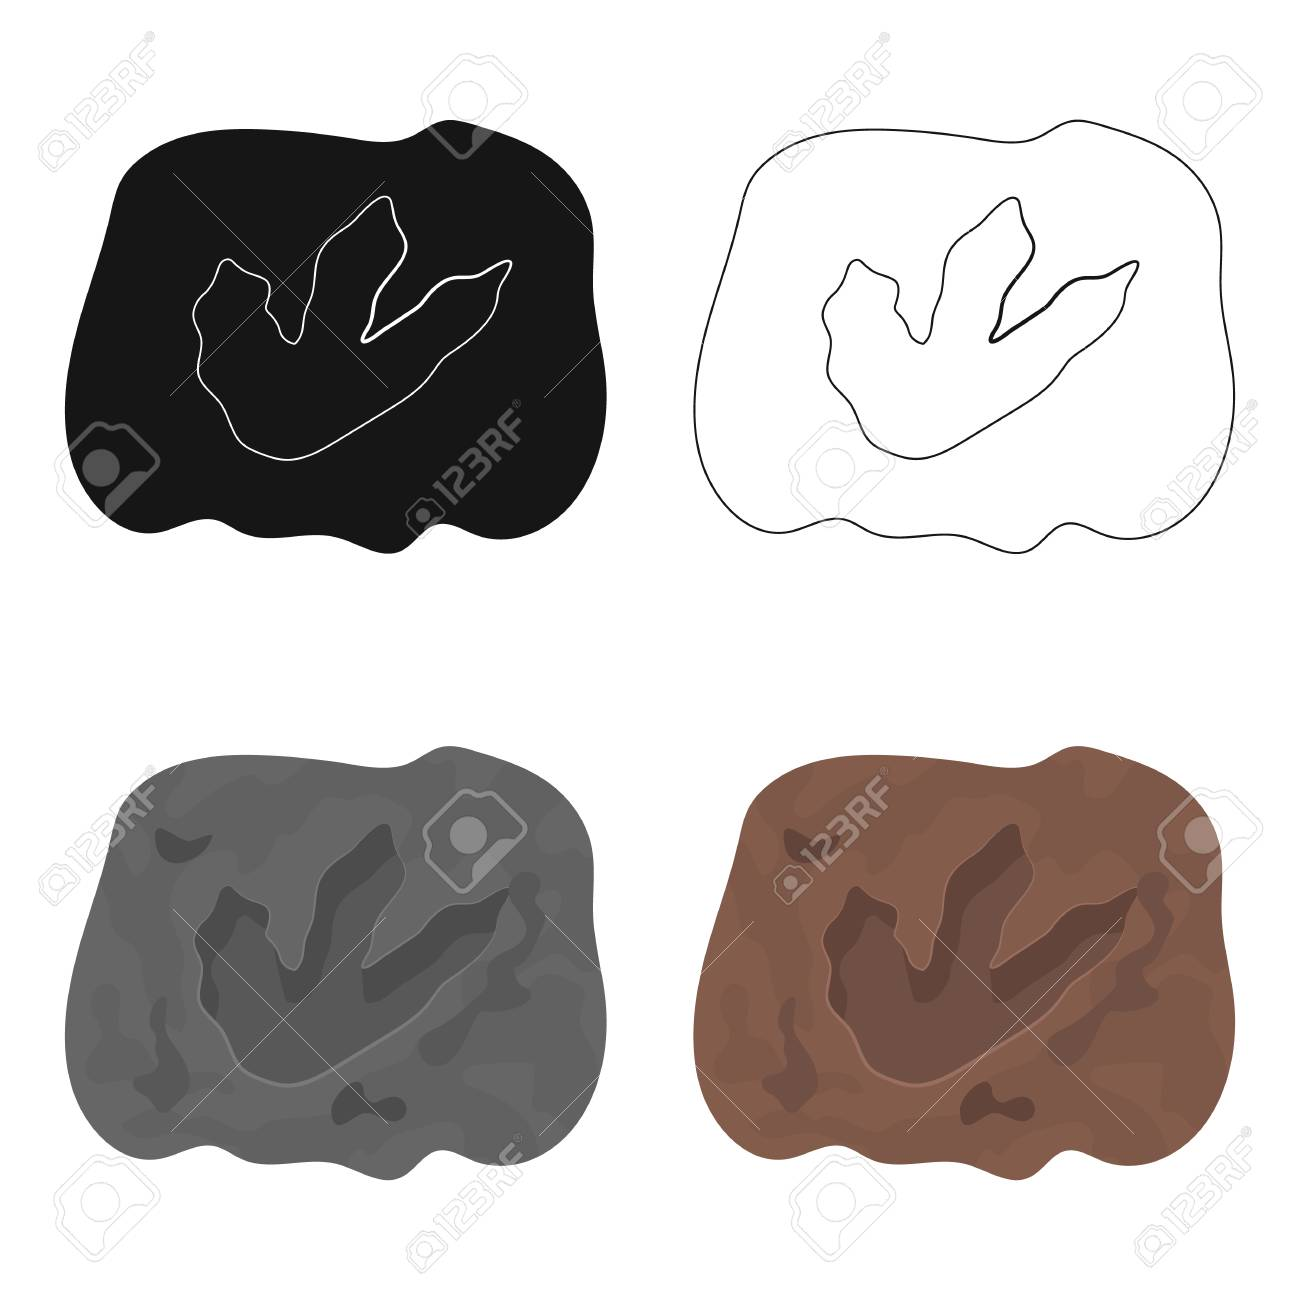 Dinosaur Footprint Drawing At Getdrawings